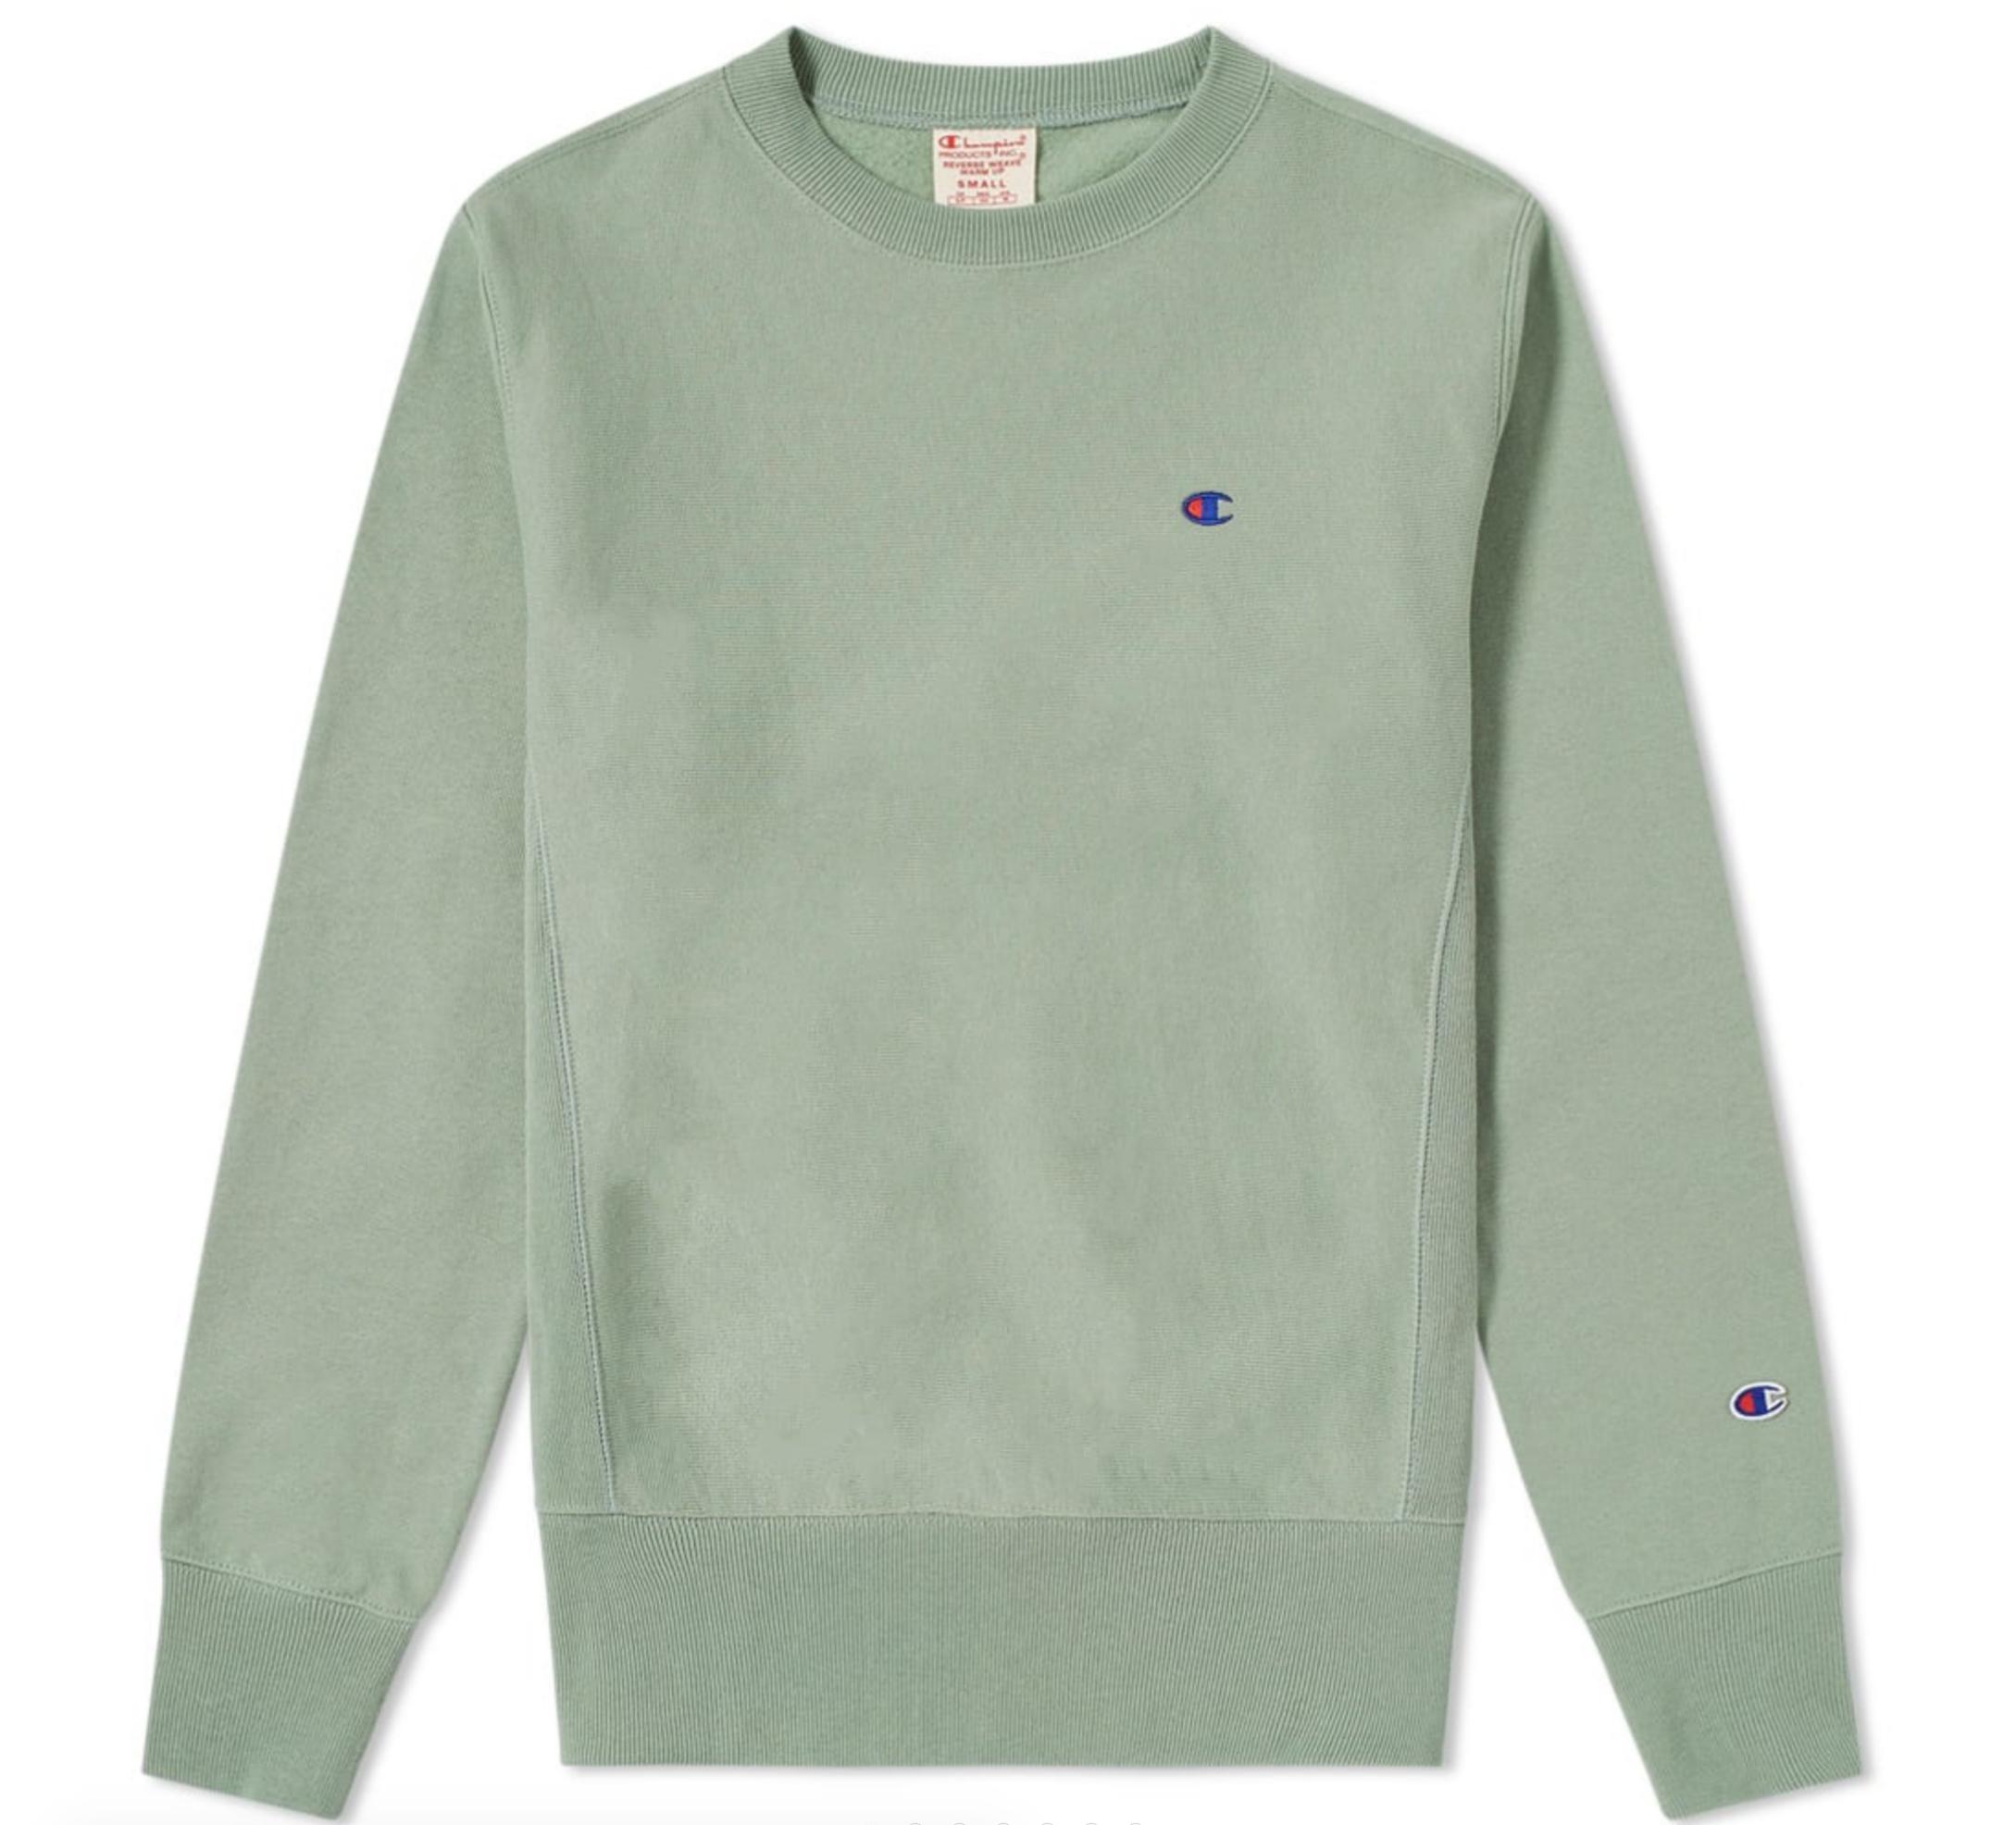 Pin By Elise Gutierrez On Sweatshirts Champion Reverse Weave Champion Sweatshirt Champion Clothing [ 1972 x 2178 Pixel ]